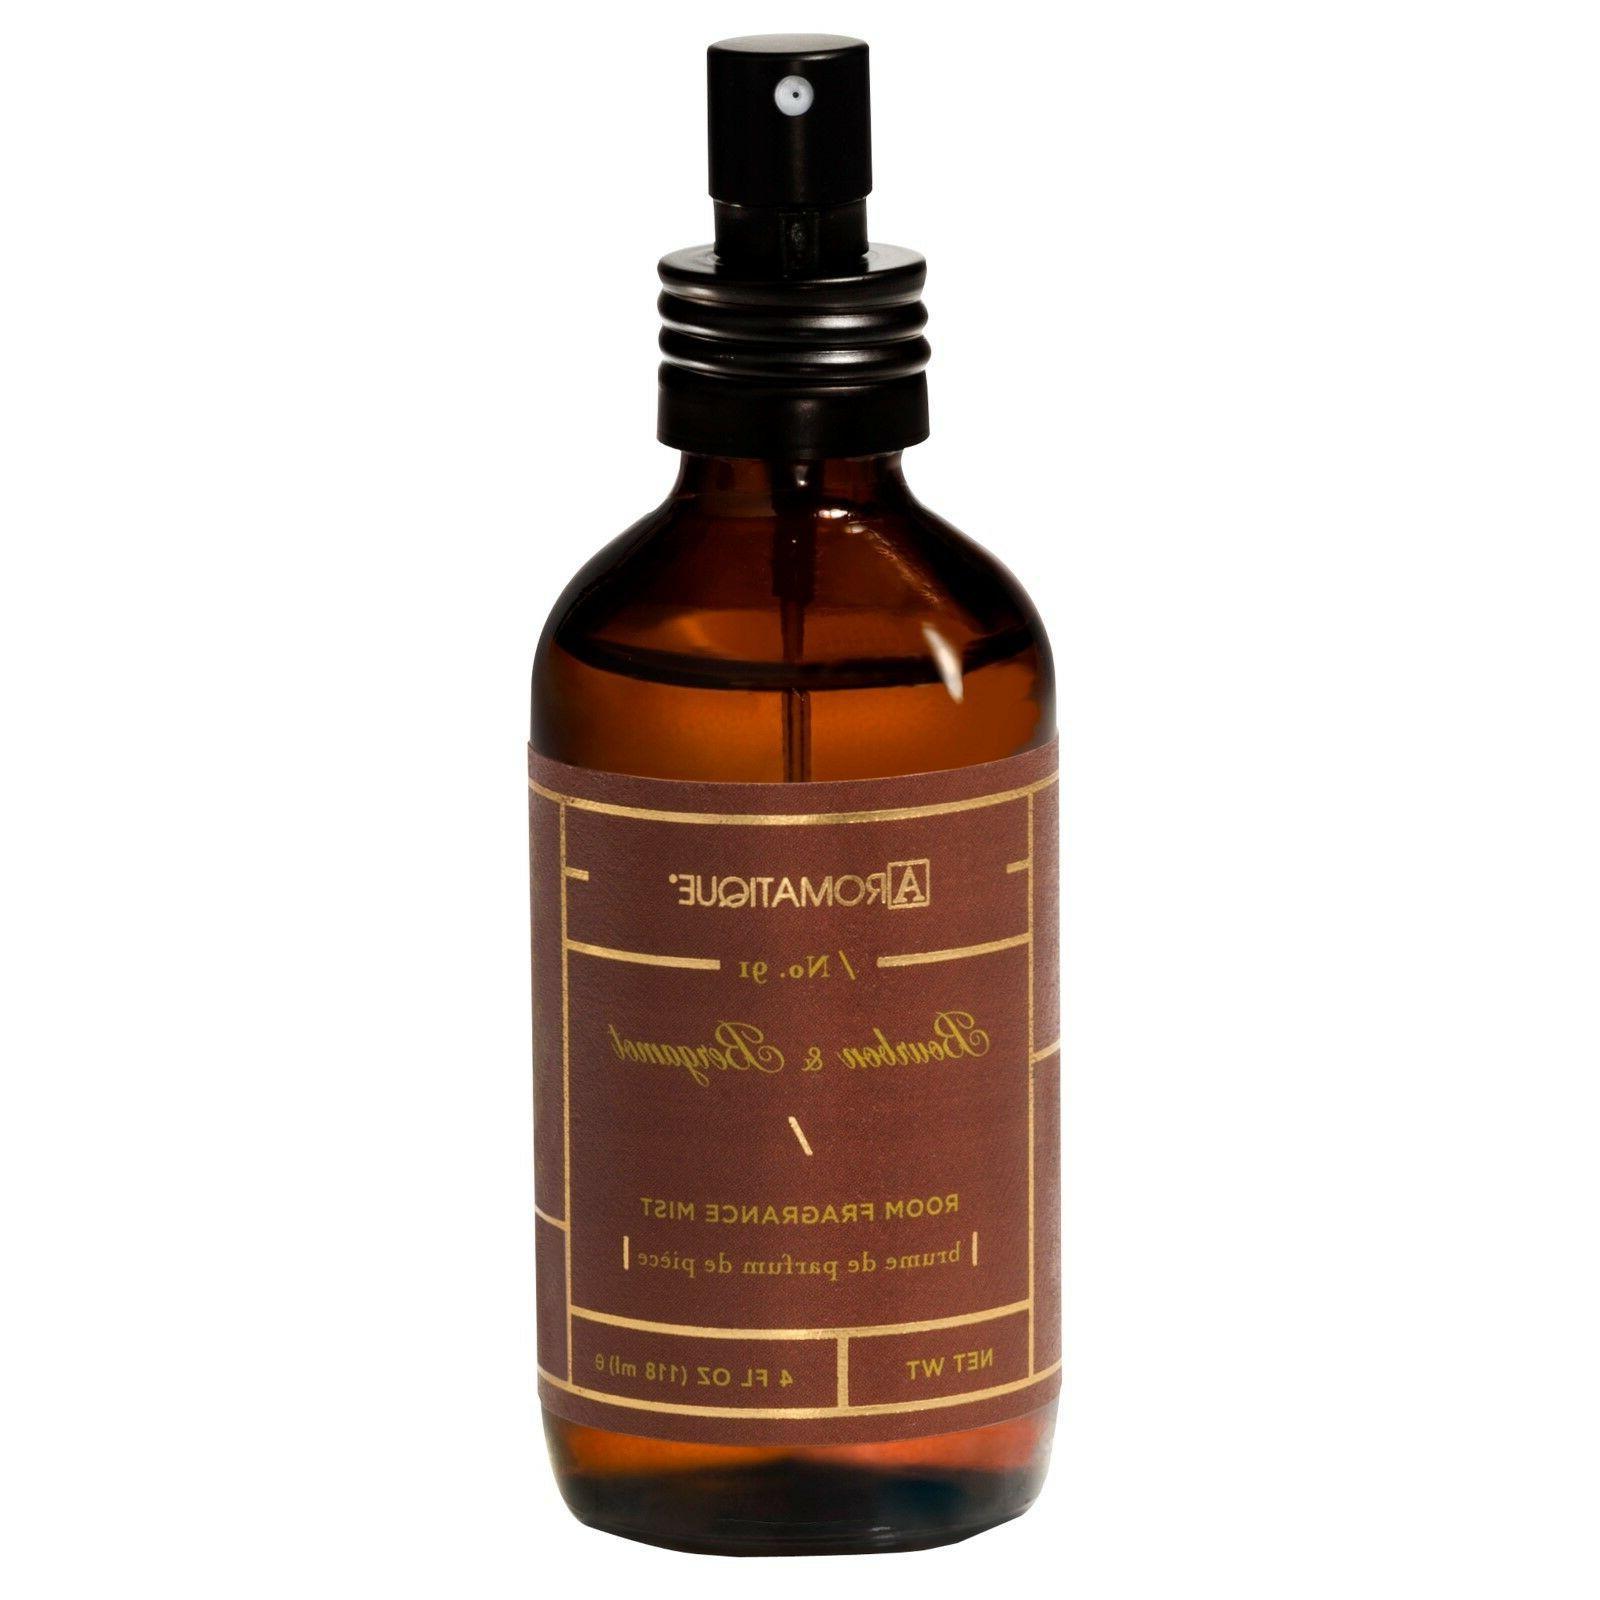 Aromatique Bourbon Bergamot Pump Room Spray 4 oz - Brown Gla